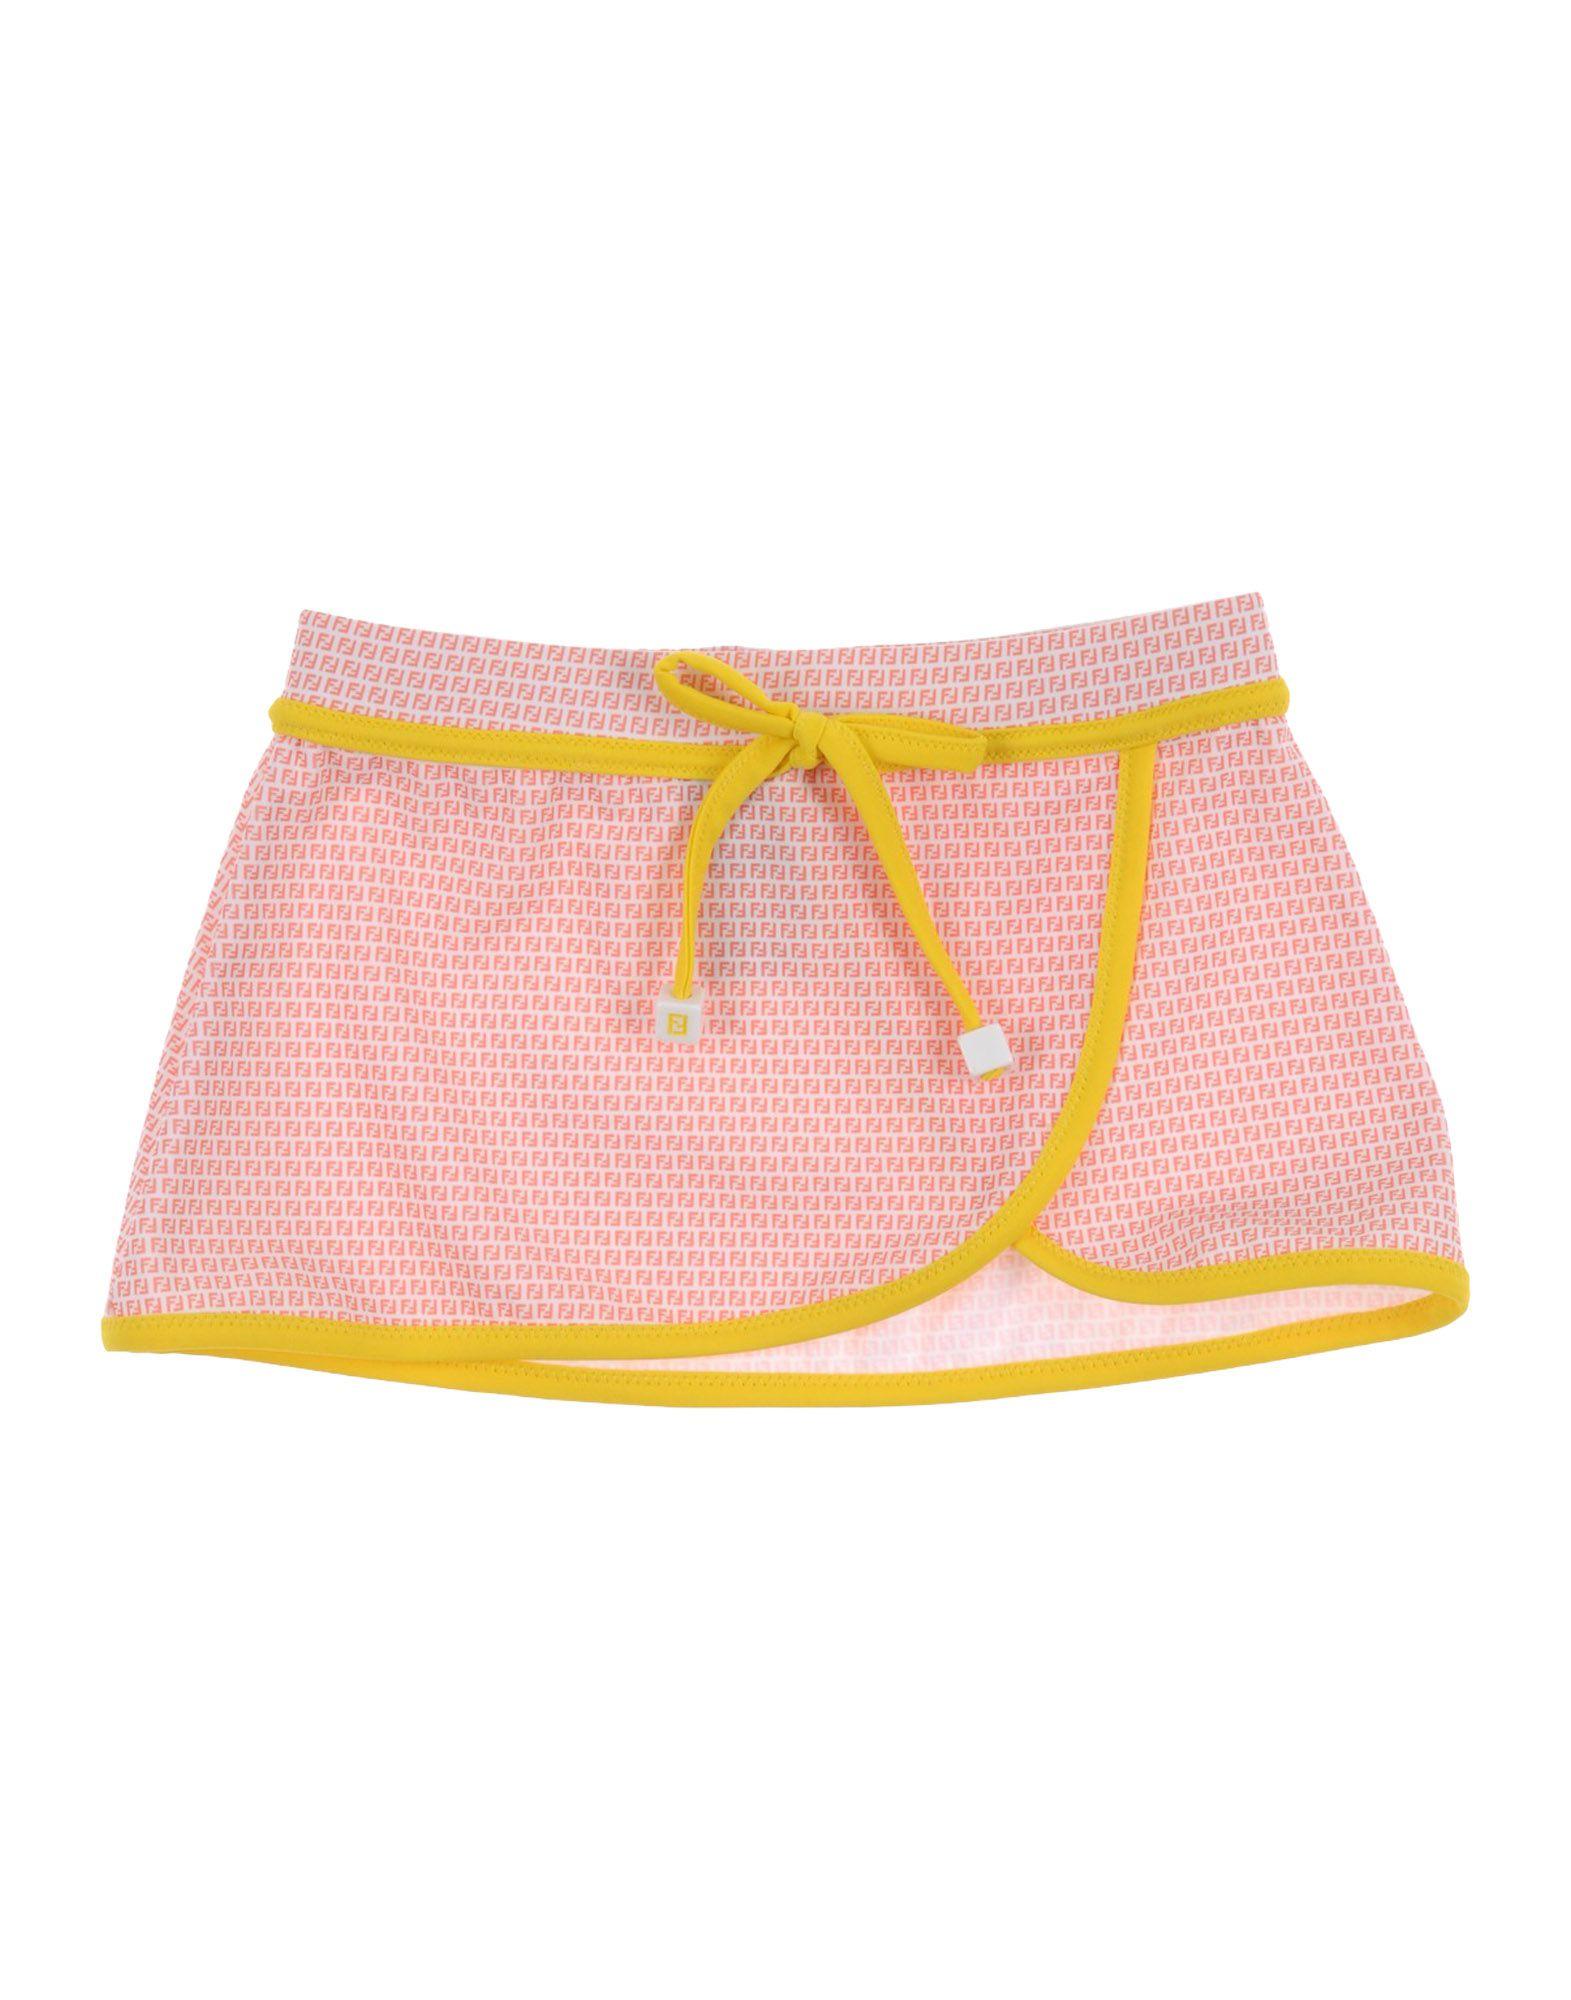 0e697b3d4b467 Fendi  Baby Swim Skirt Cover Up from Stush Fashionista